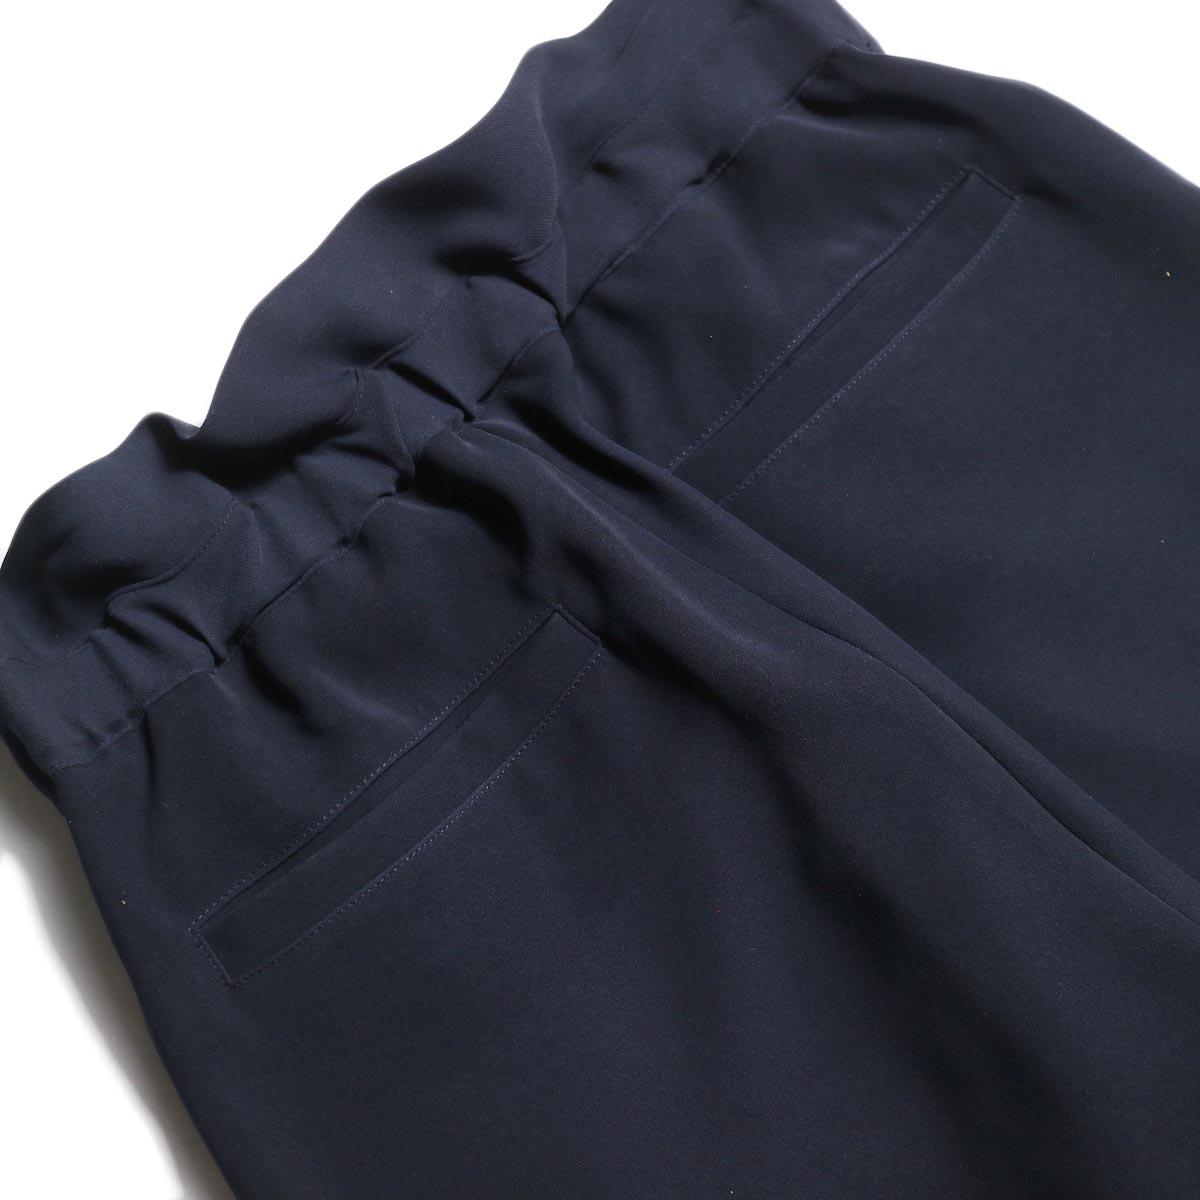 WHYTO. / ランダムタック オケージョンパンツ (Navy) バッグポケット